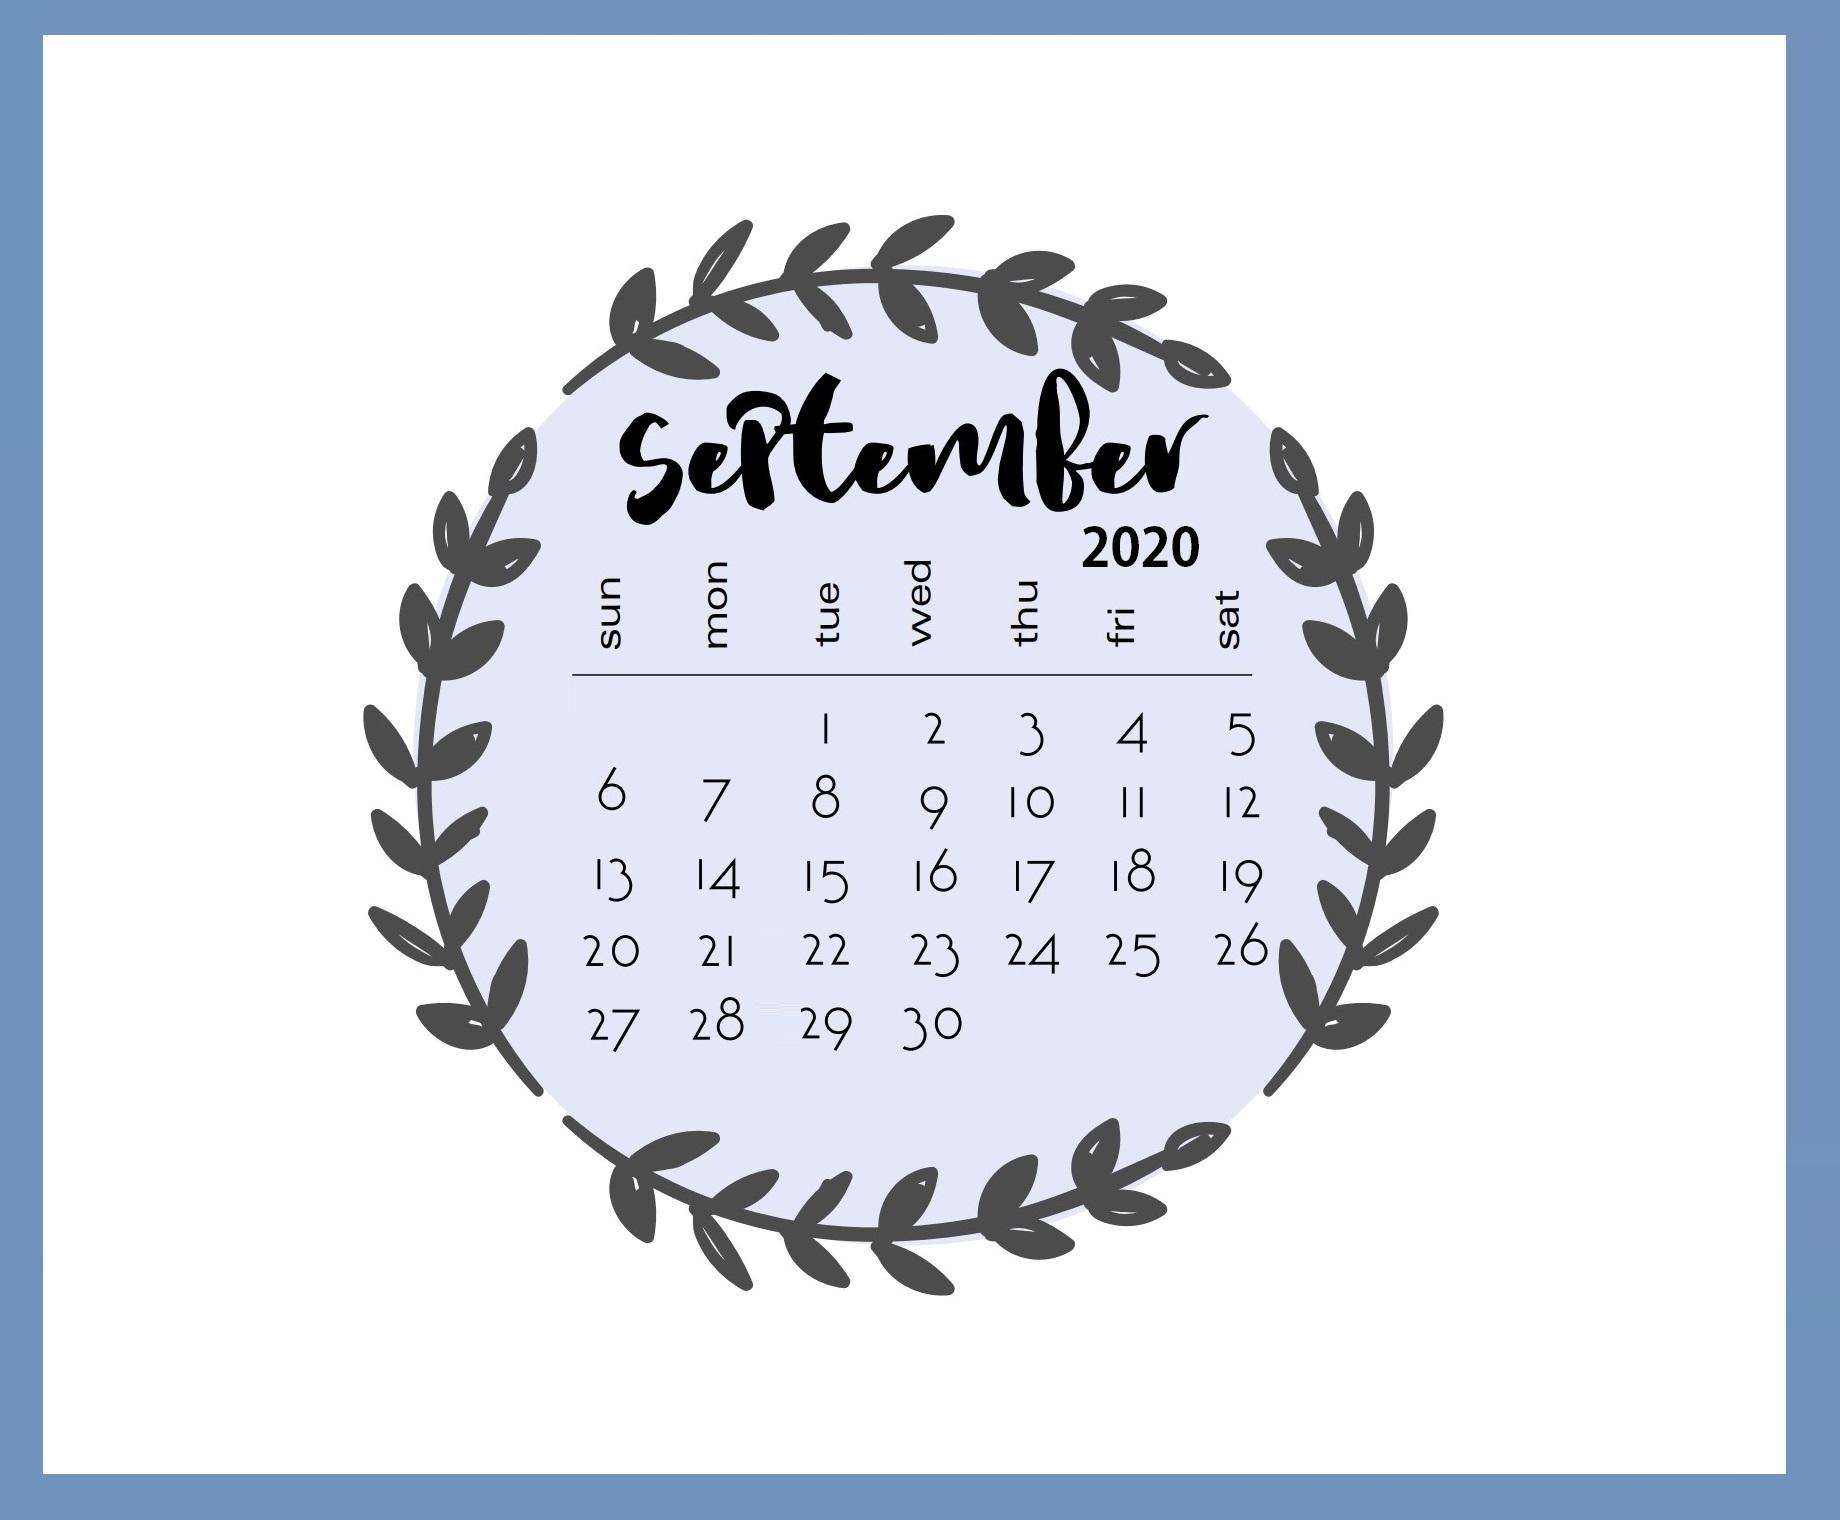 September 2020 Calendar Colorful Date Sheet